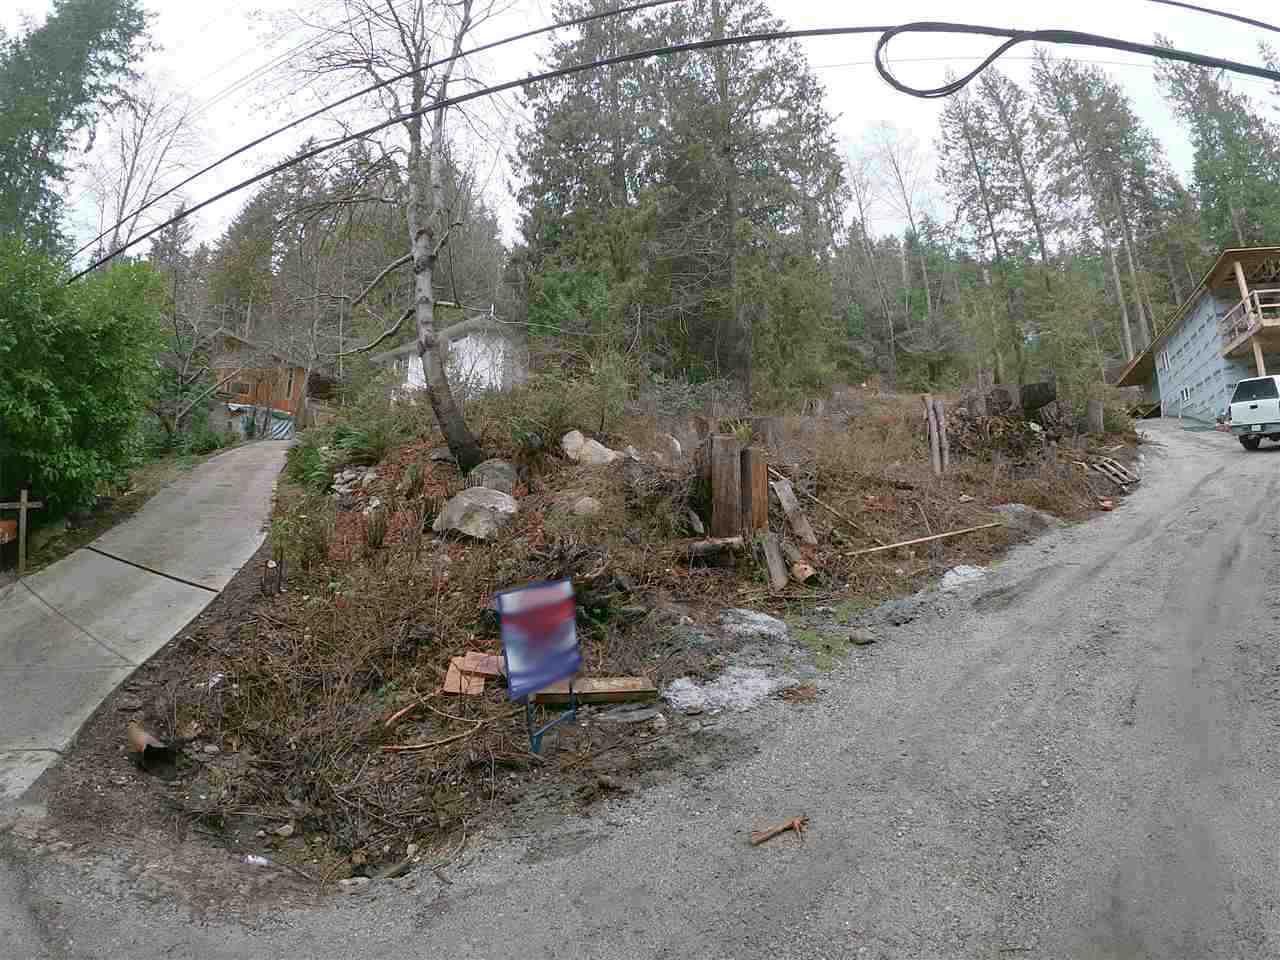 Main Photo: Lot 11 SECHELT INLET Road in Sechelt: Sechelt District Home for sale (Sunshine Coast)  : MLS®# R2333235